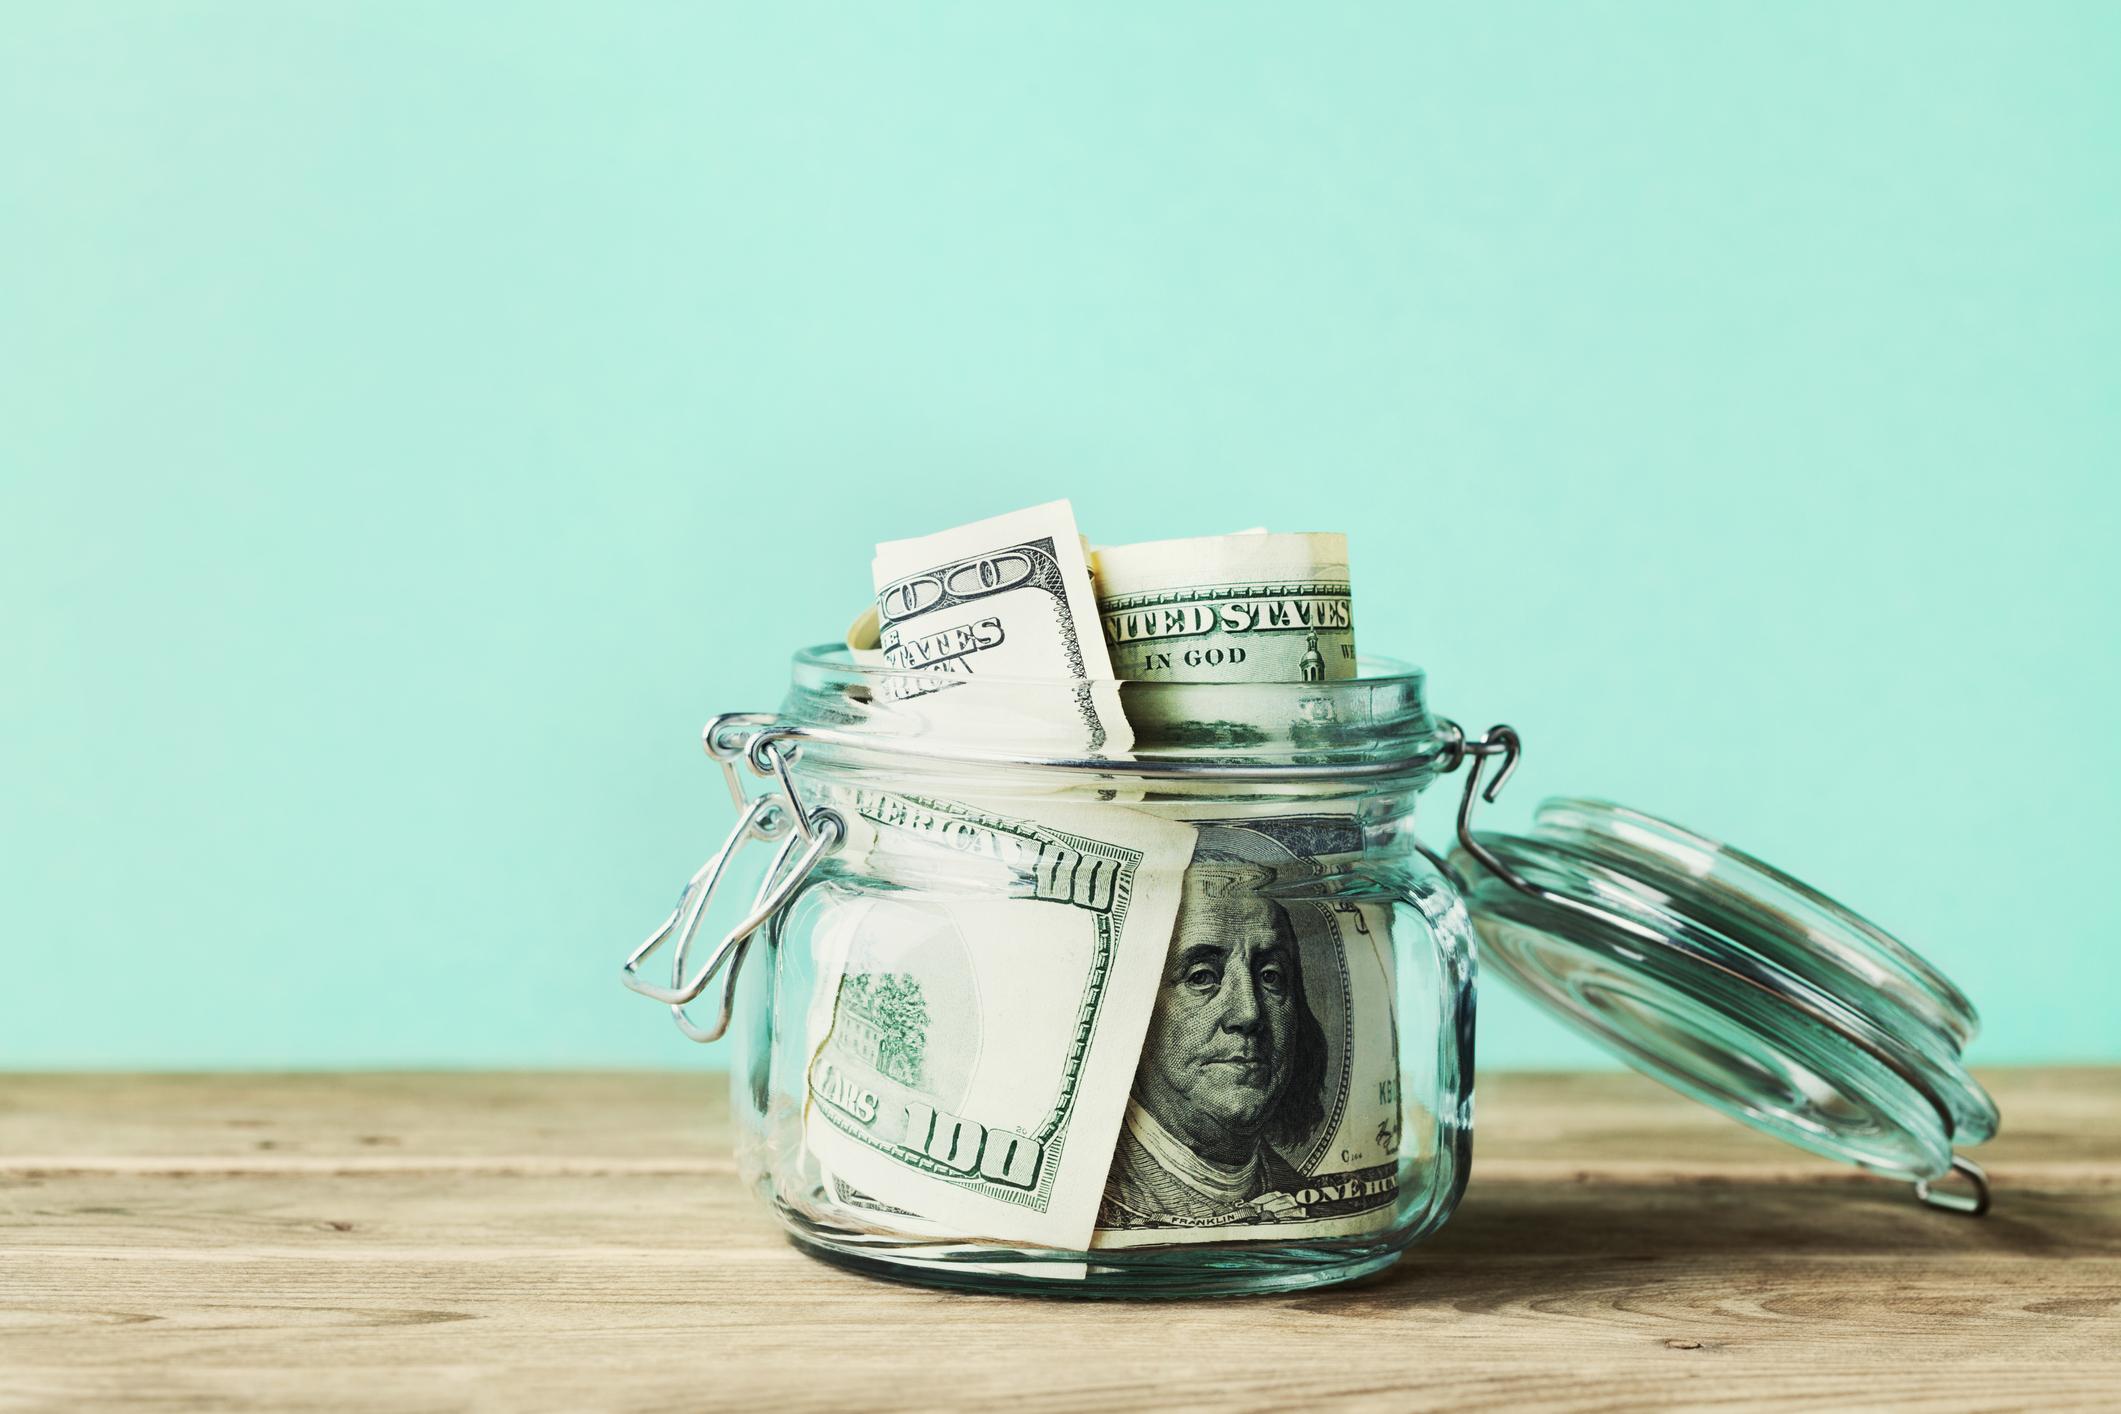 Hundred dollar bills in a glass jar.